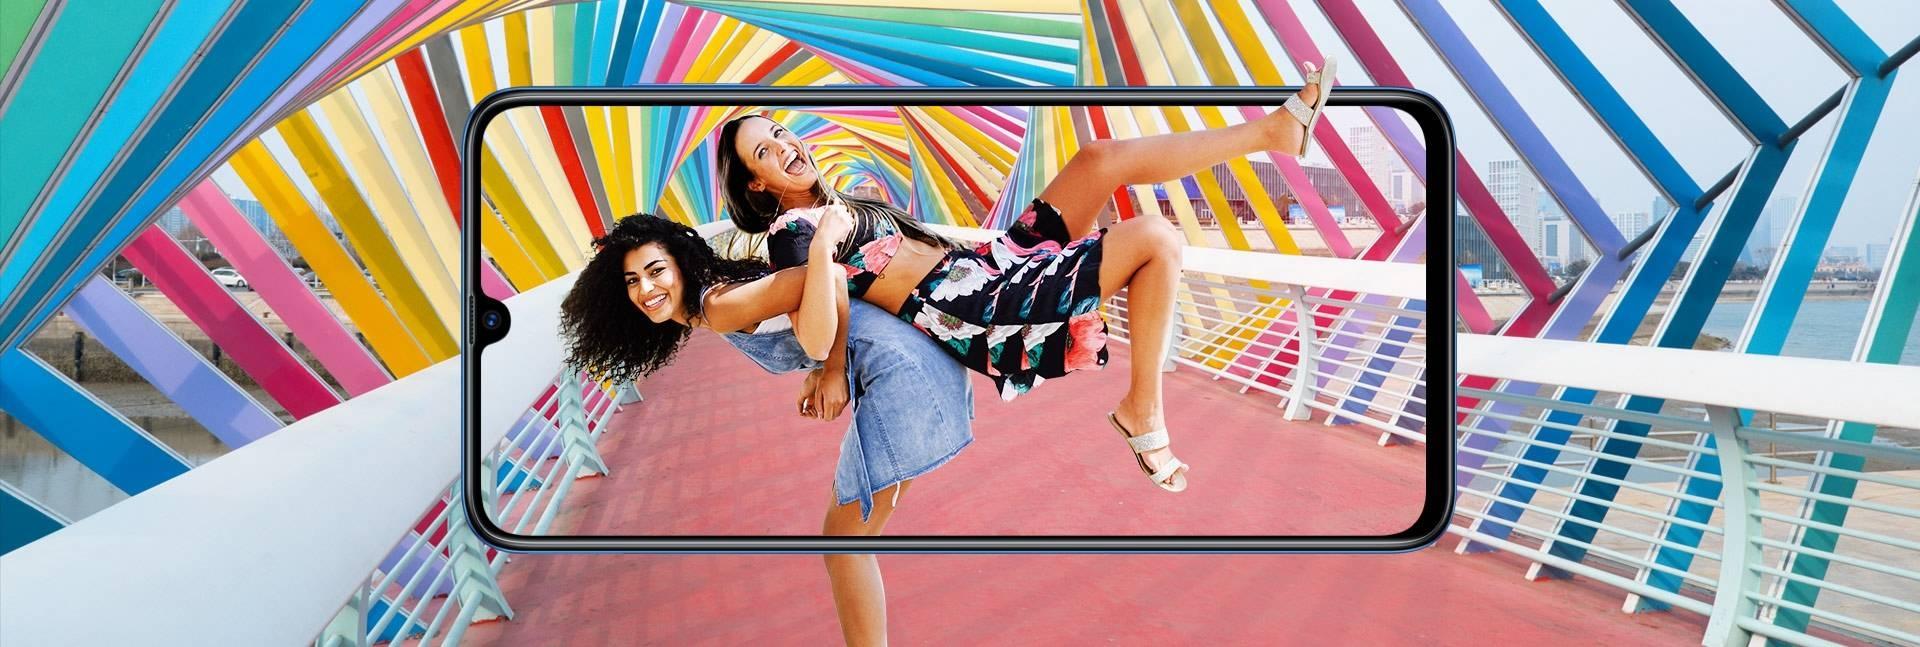 Samsung Galaxy A70 - sAmoled 6.7 inch Infinity-U Display